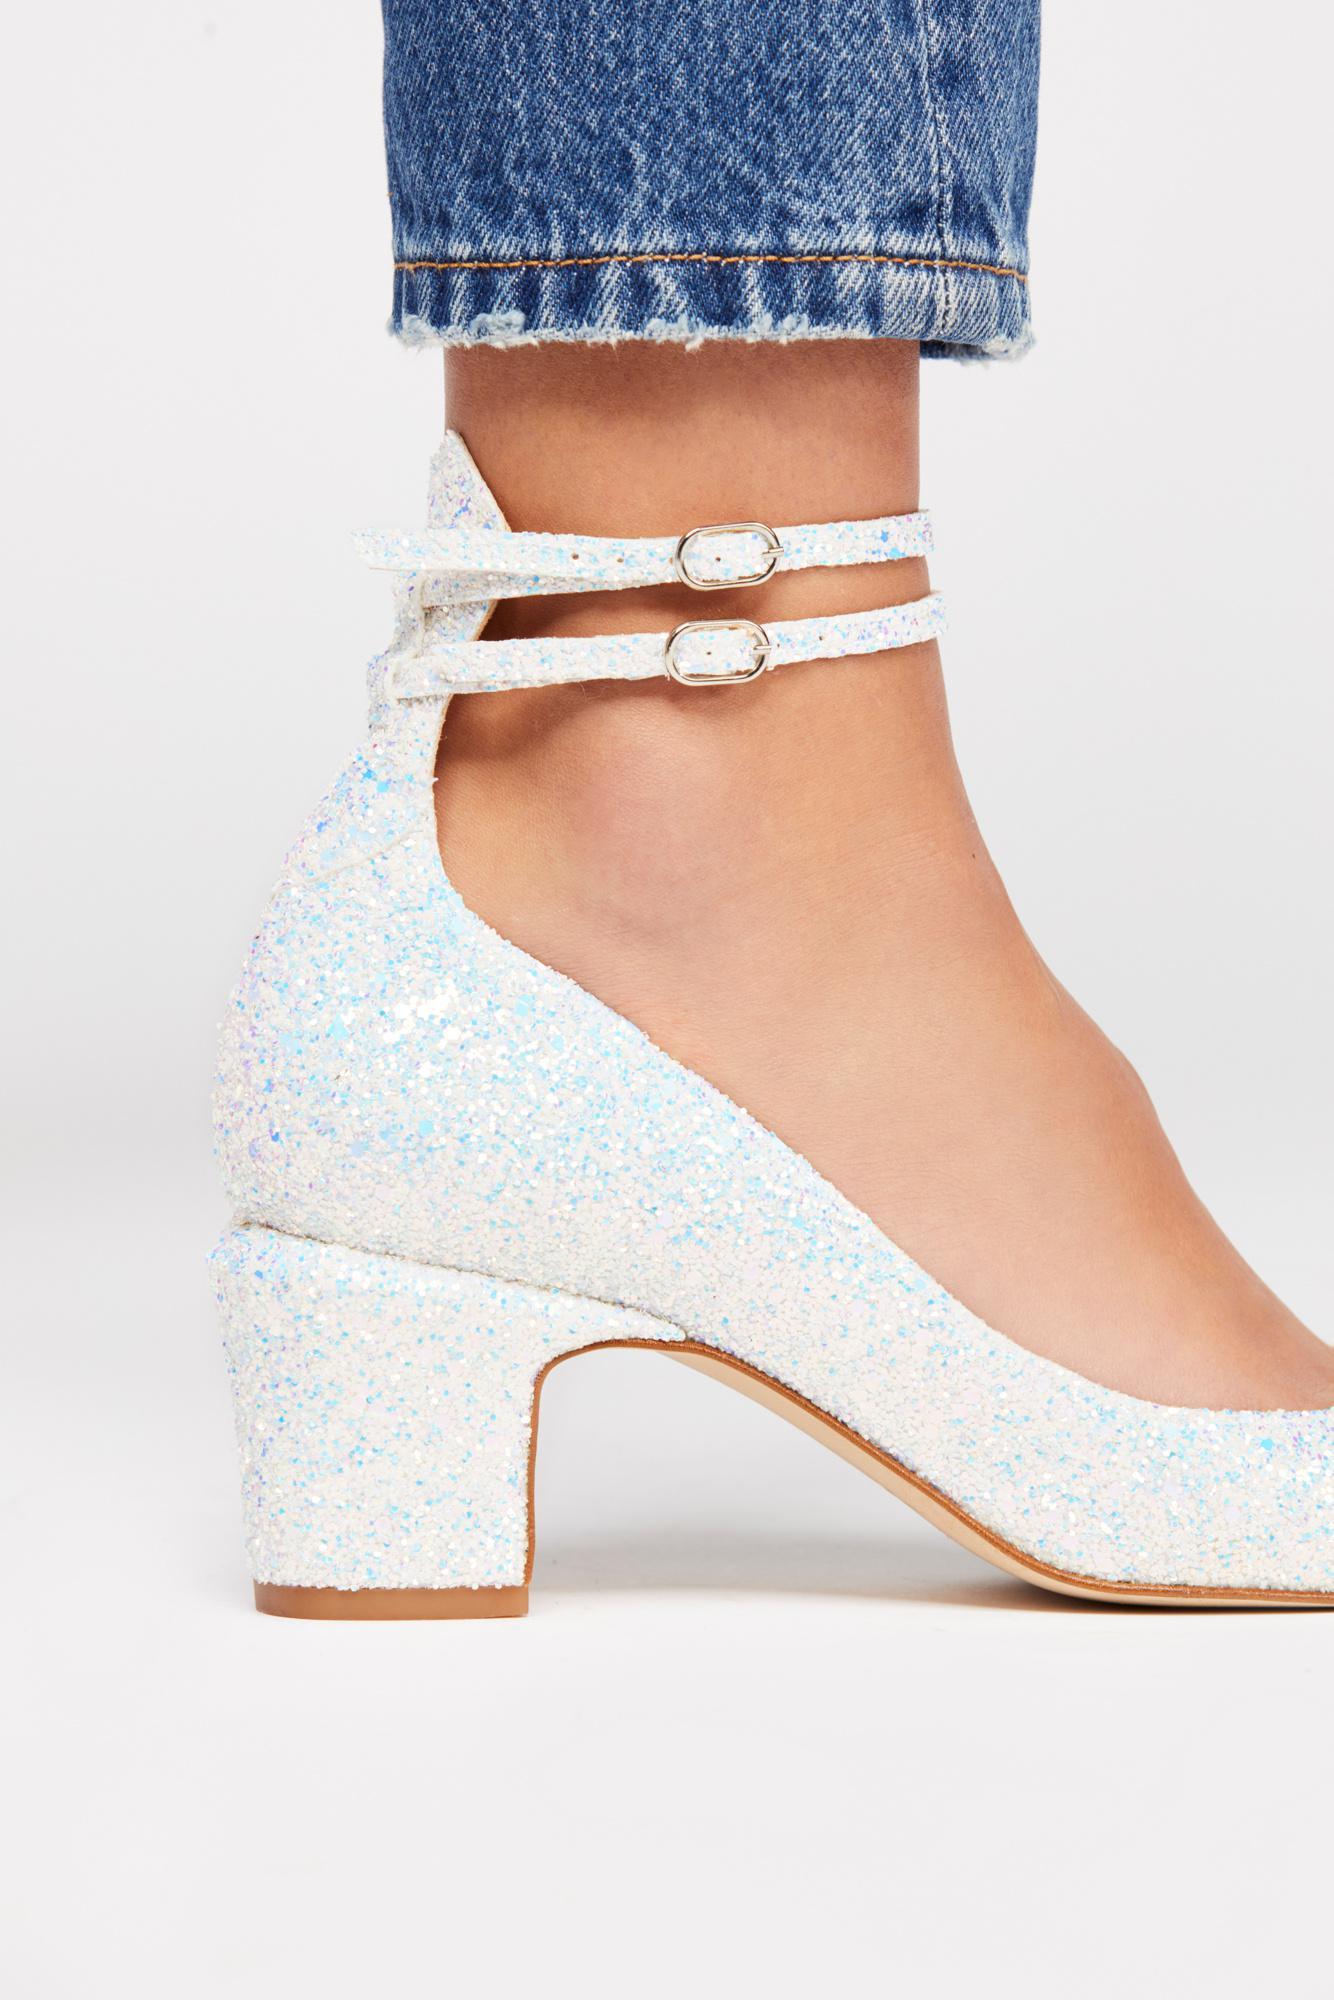 6ad32ef29da Lyst - Free People Glitter Lana Block Heel in White